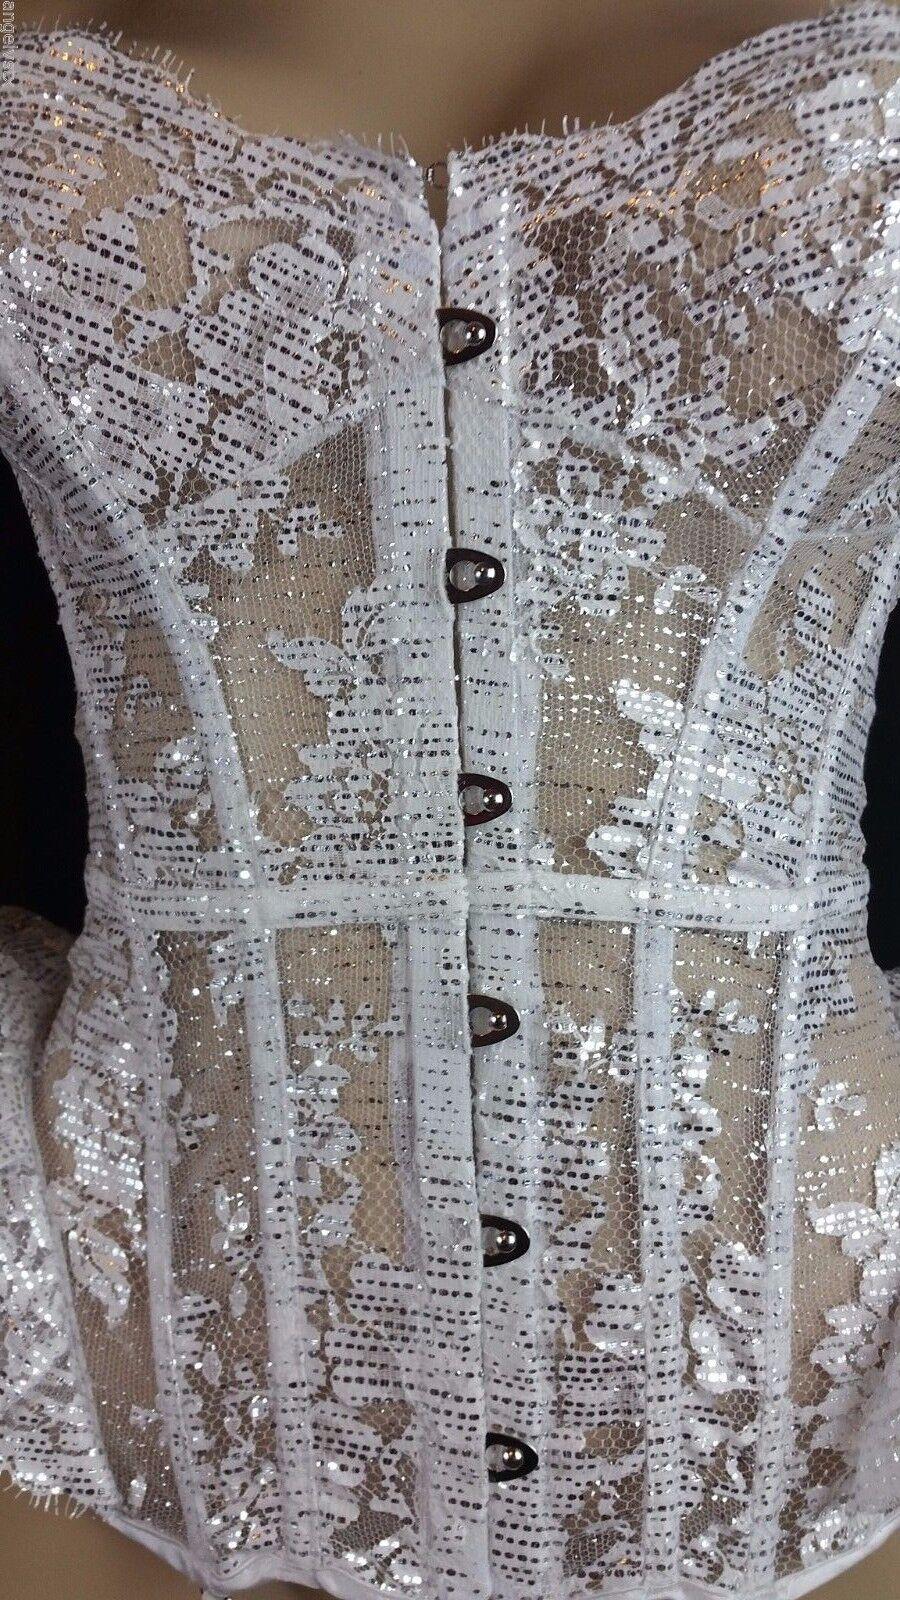 34 C Victoria's Secret DESIGNER COLLECTION Corset Garter White Silver Lace $498